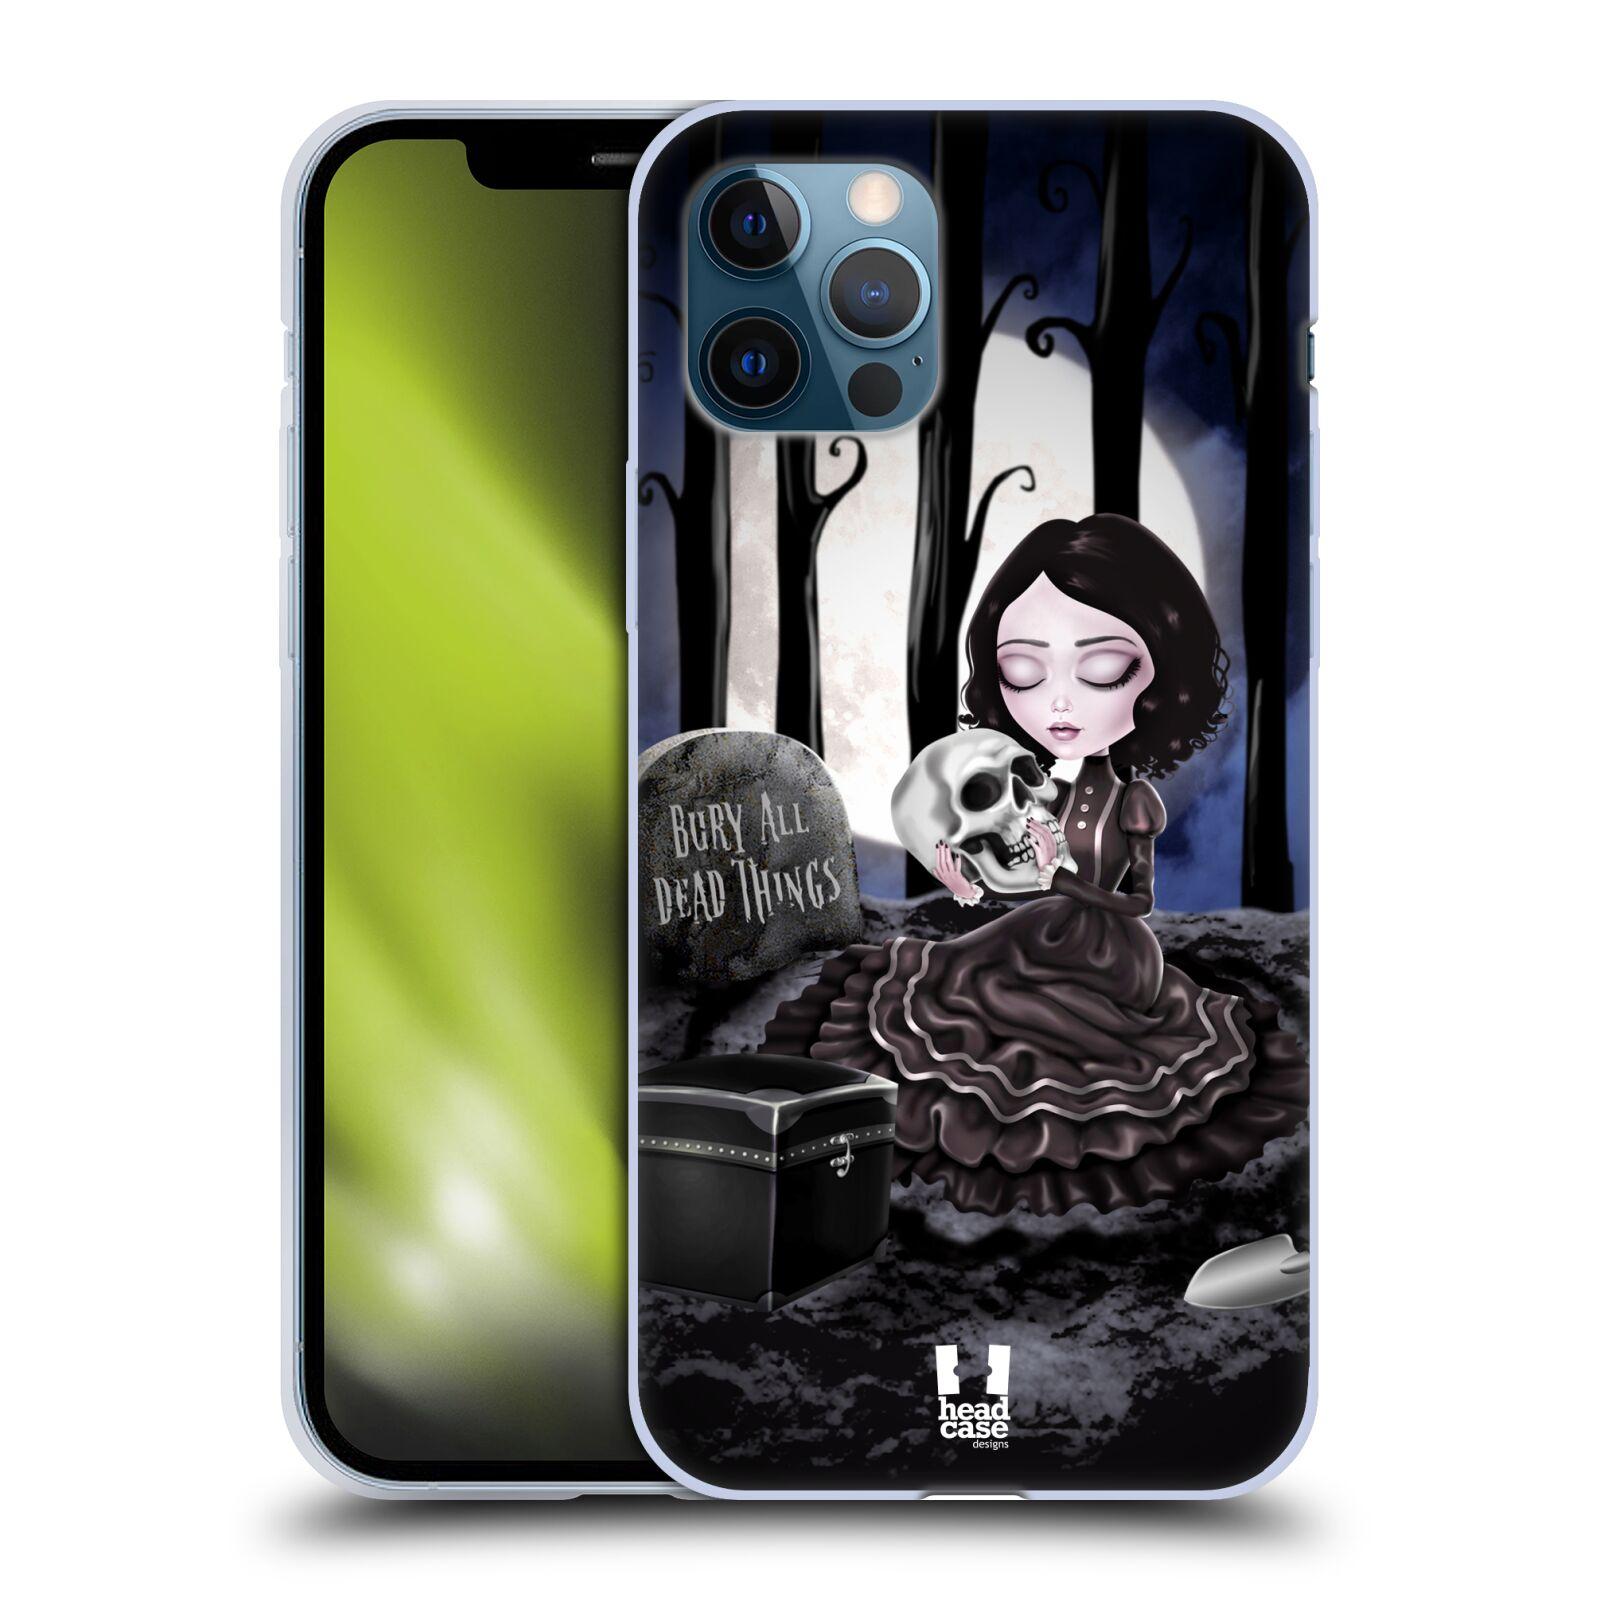 Silikonové pouzdro na mobil Apple iPhone 12 / 12 Pro - Head Case - MACABRE HŘBITOV